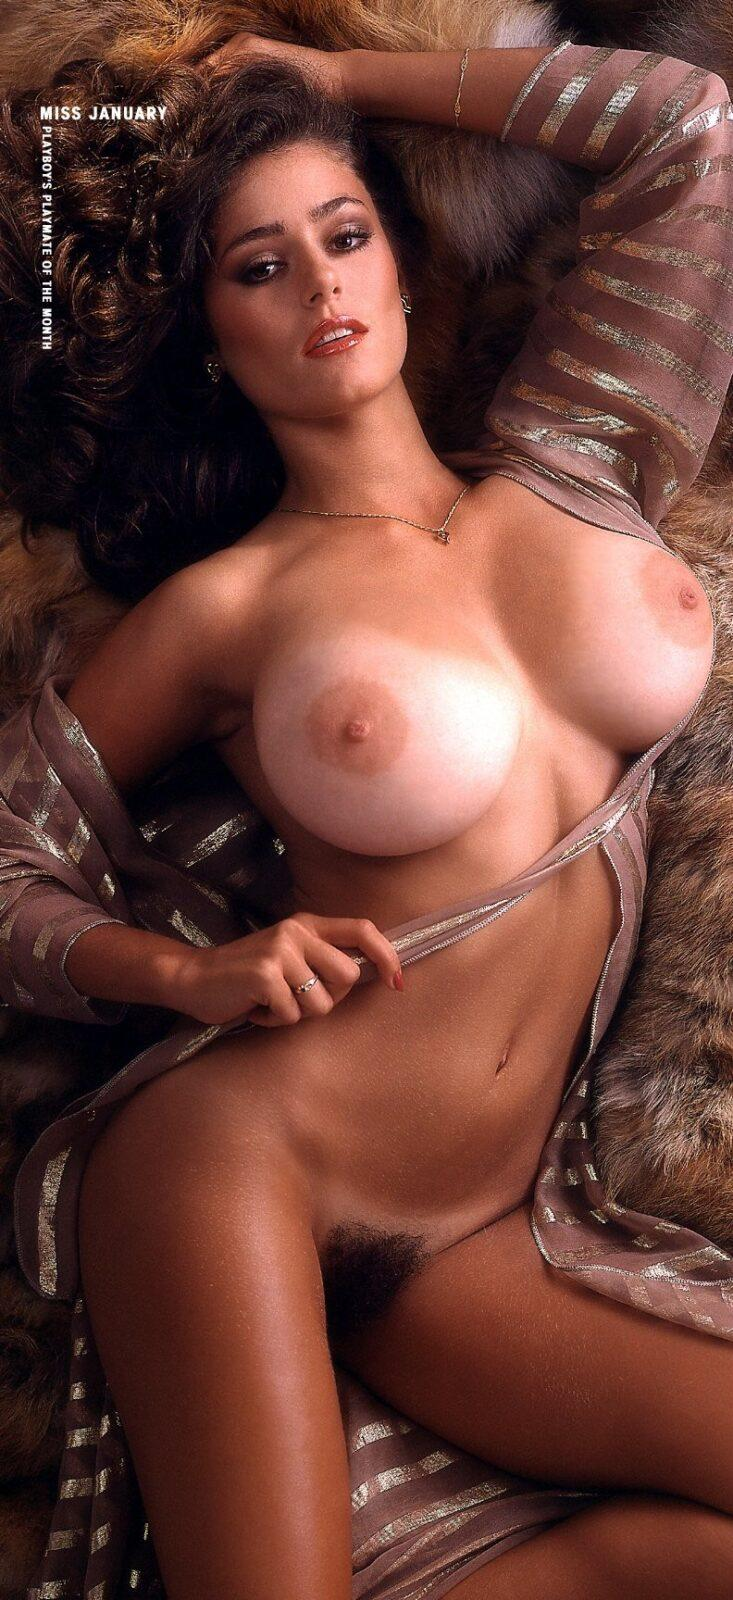 Young girl selfie nude